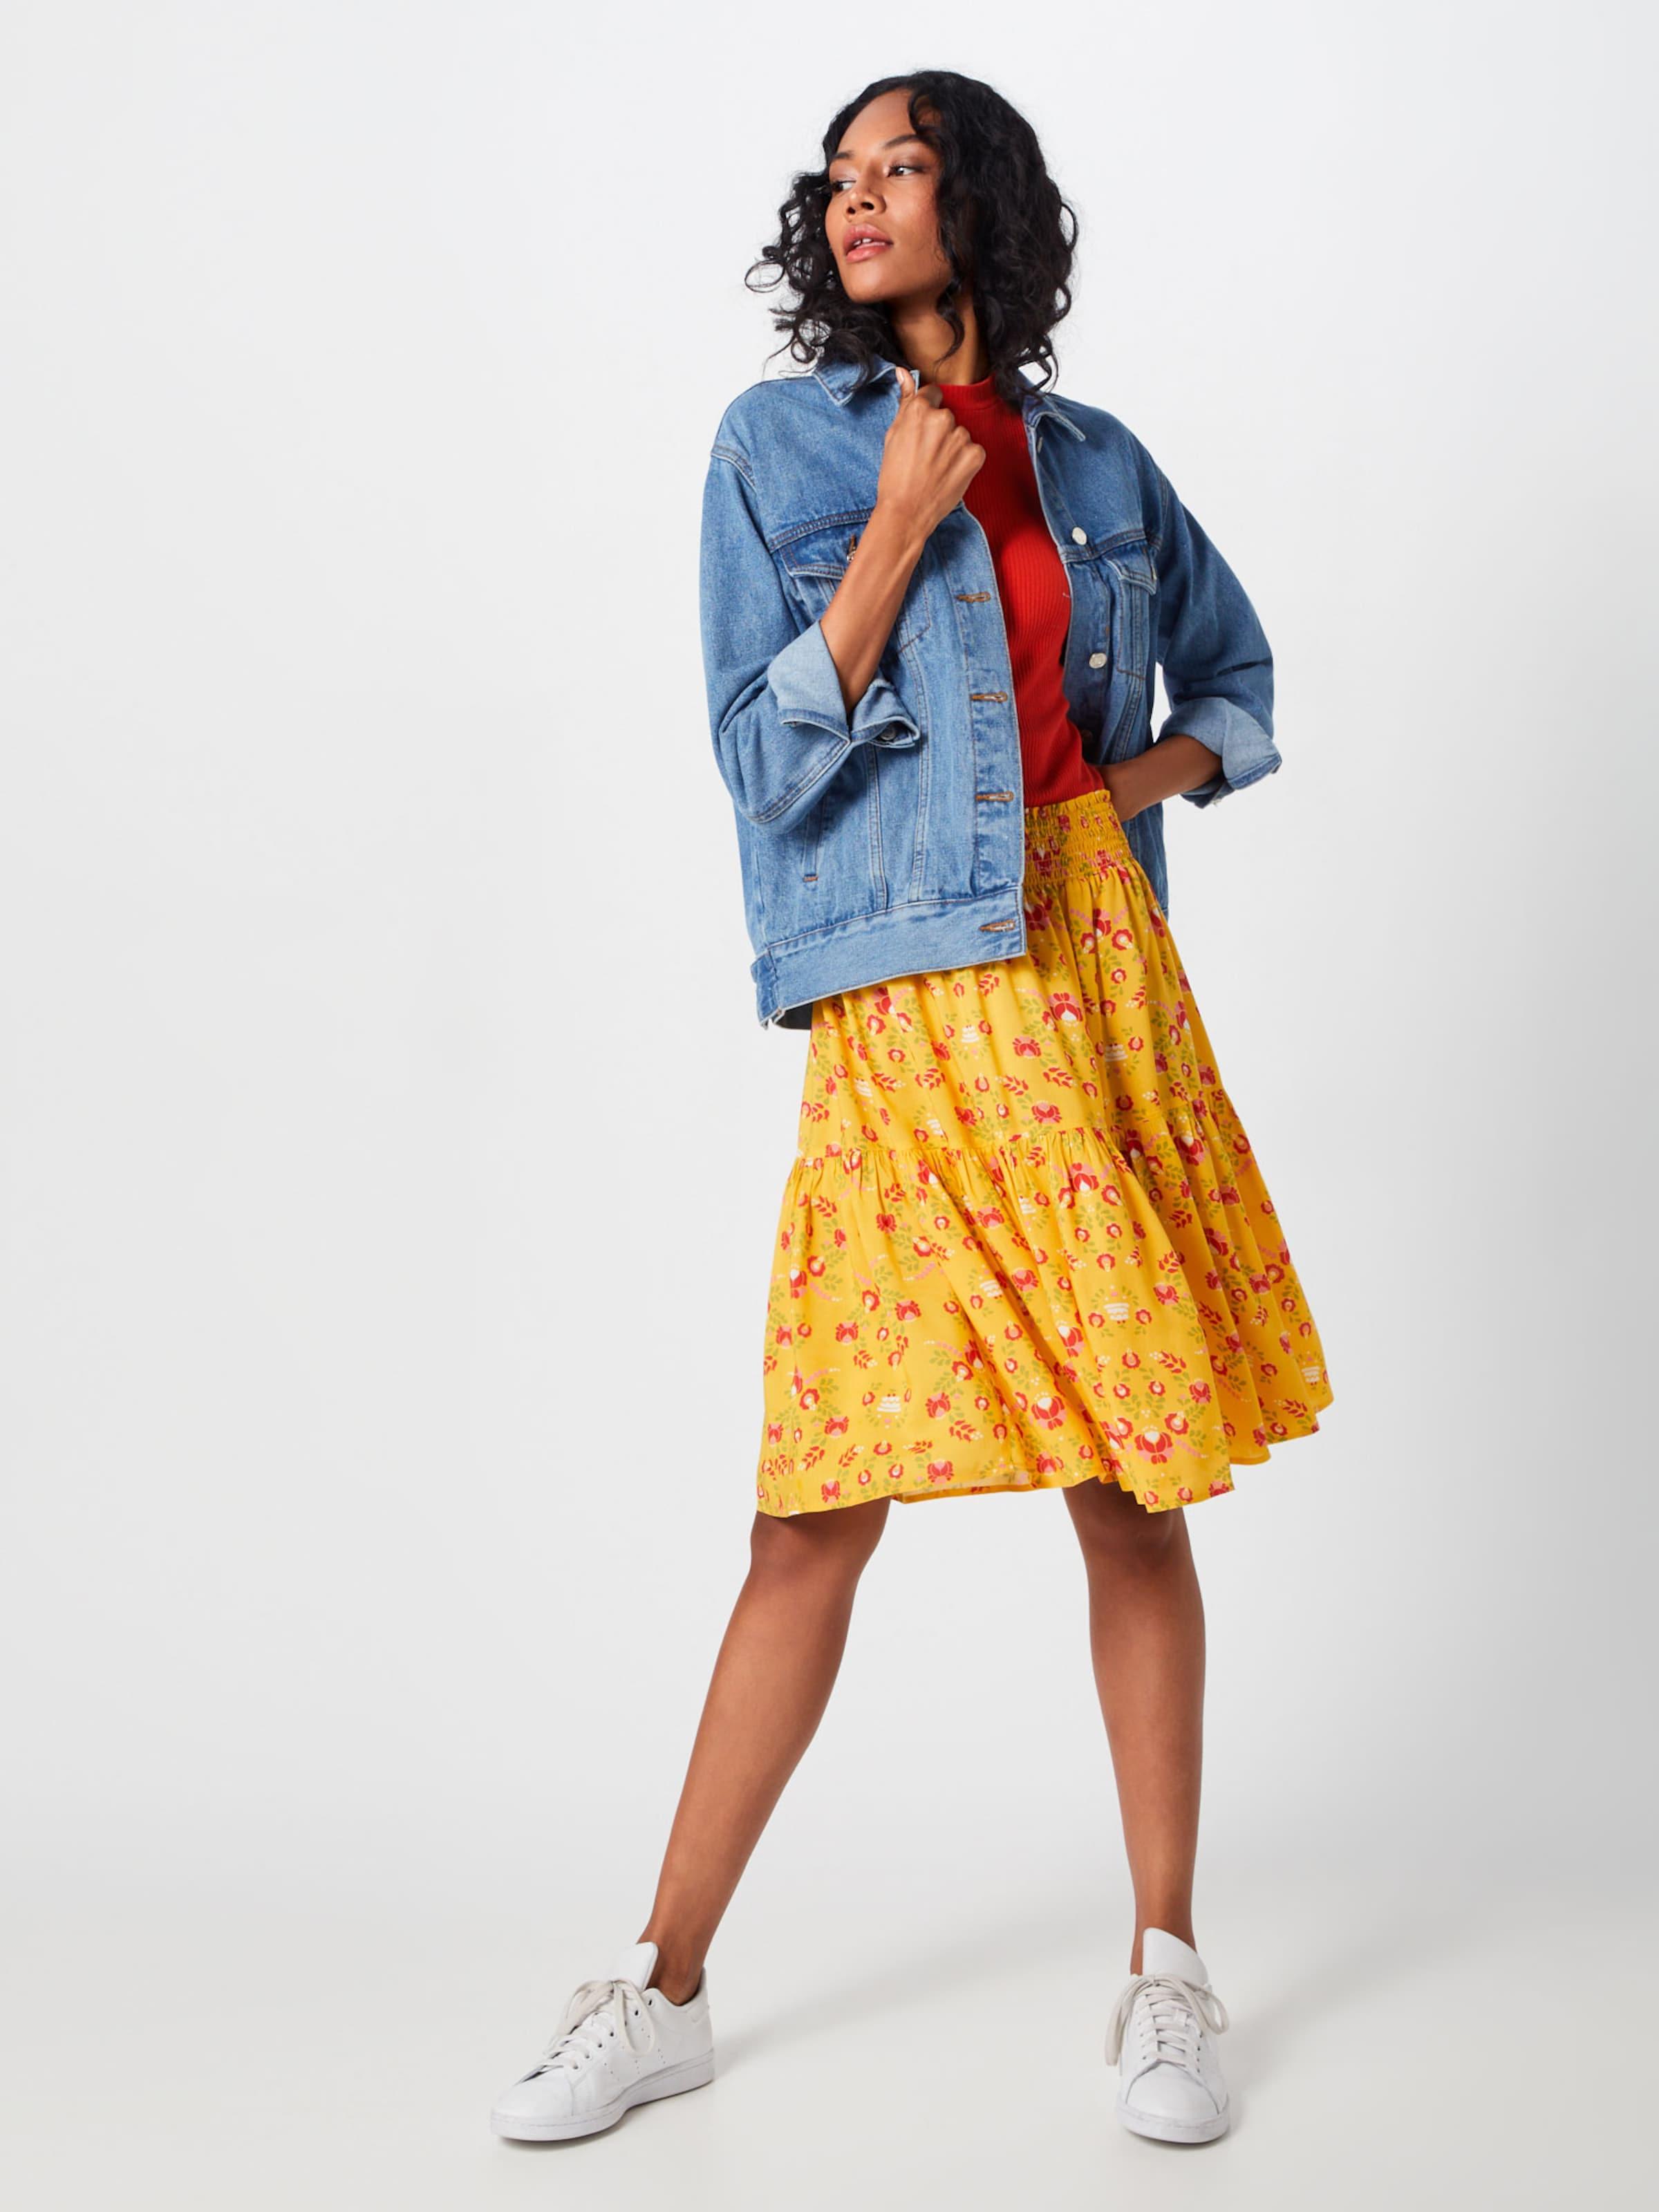 Skirt' Jupe 'wanderwirbel JauneRouge Blutsgeschwister En 4qR5AjLc3